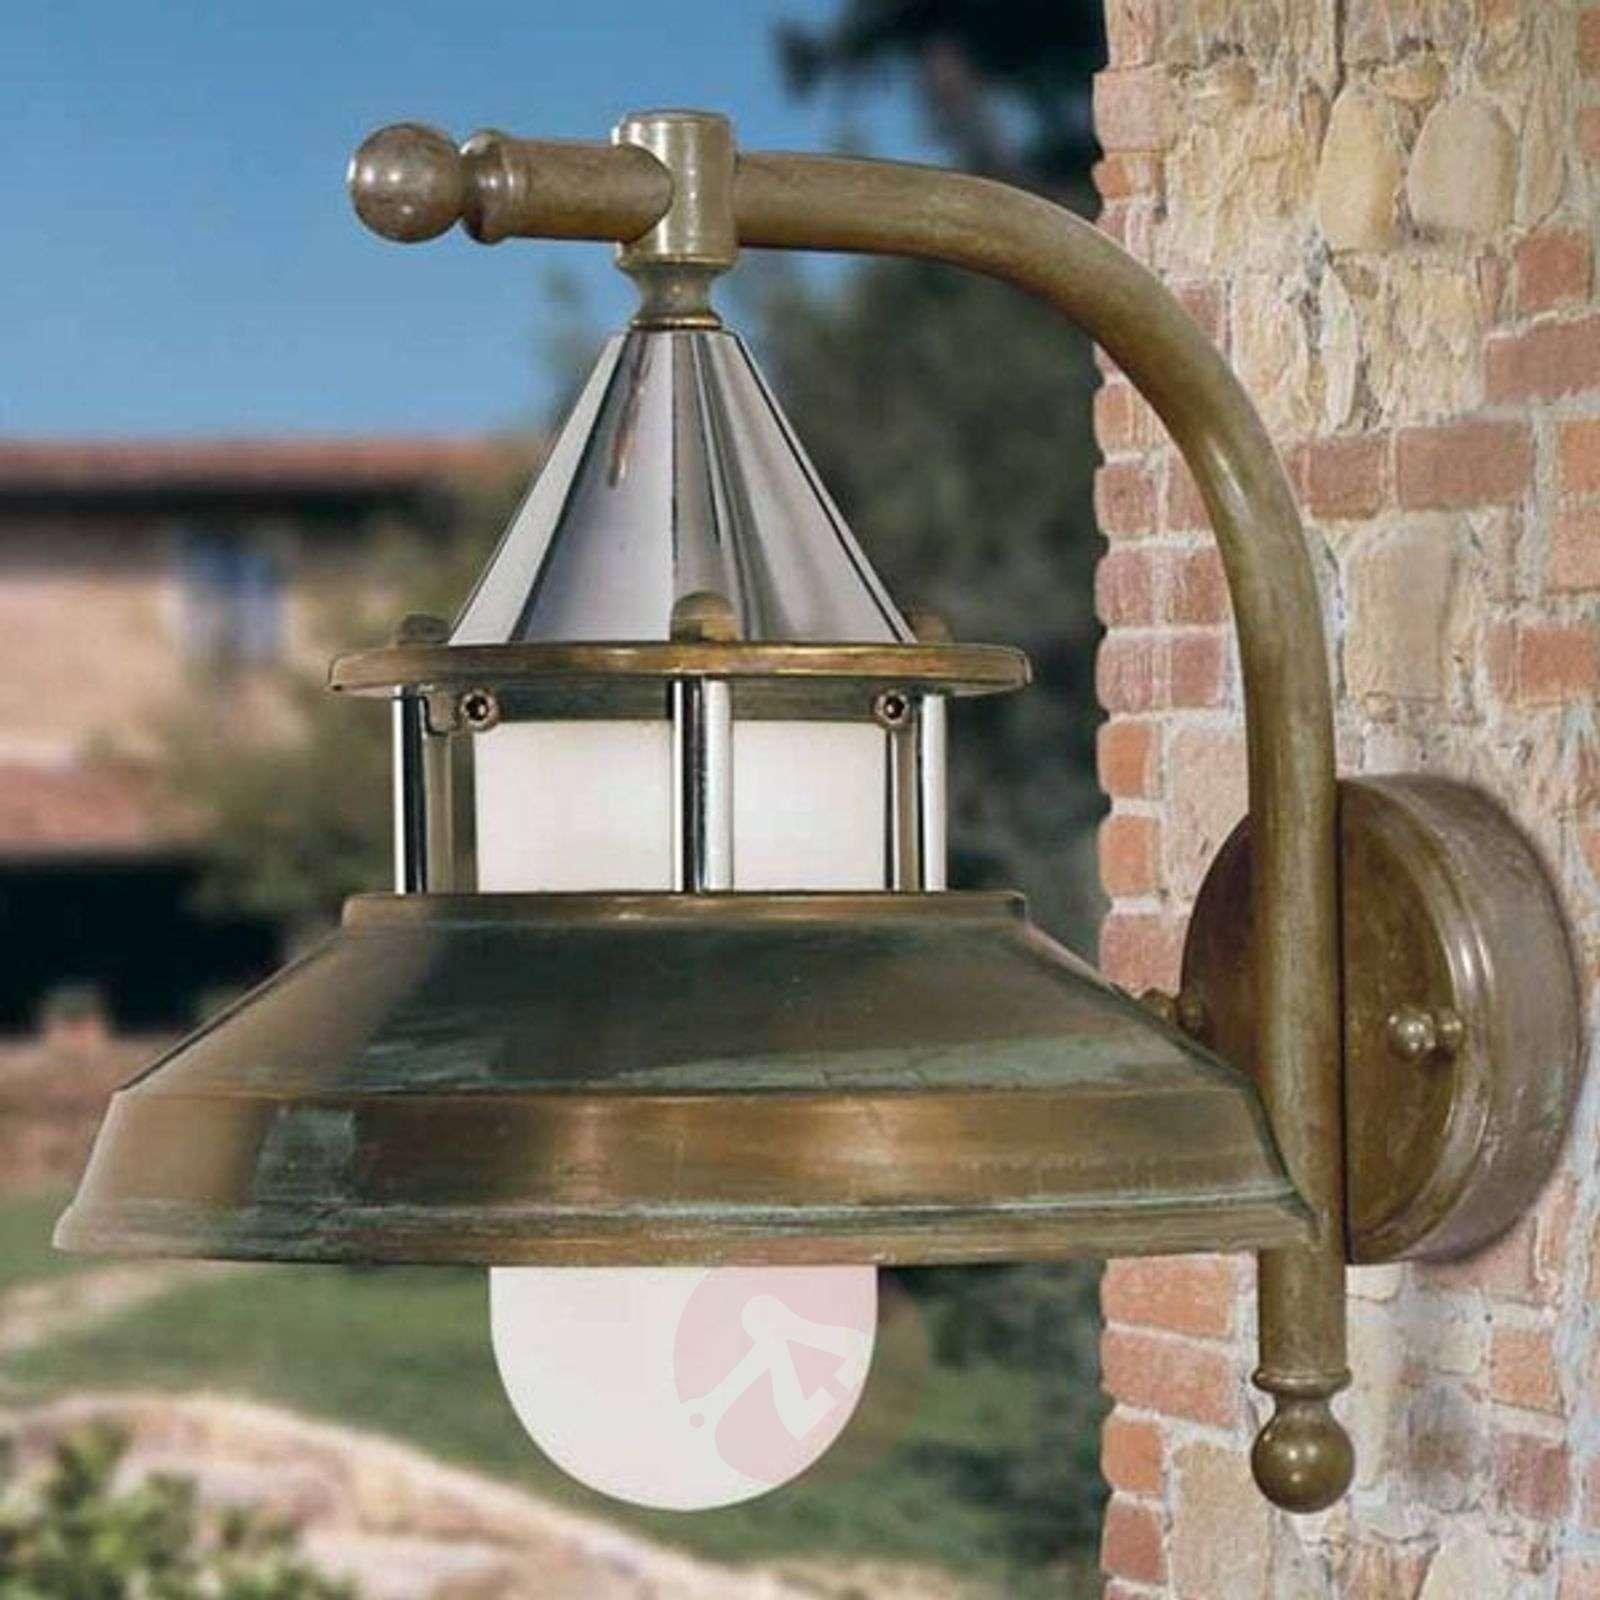 Outdoor wall light Antique, 30 cm, antique-copper-6515085-01